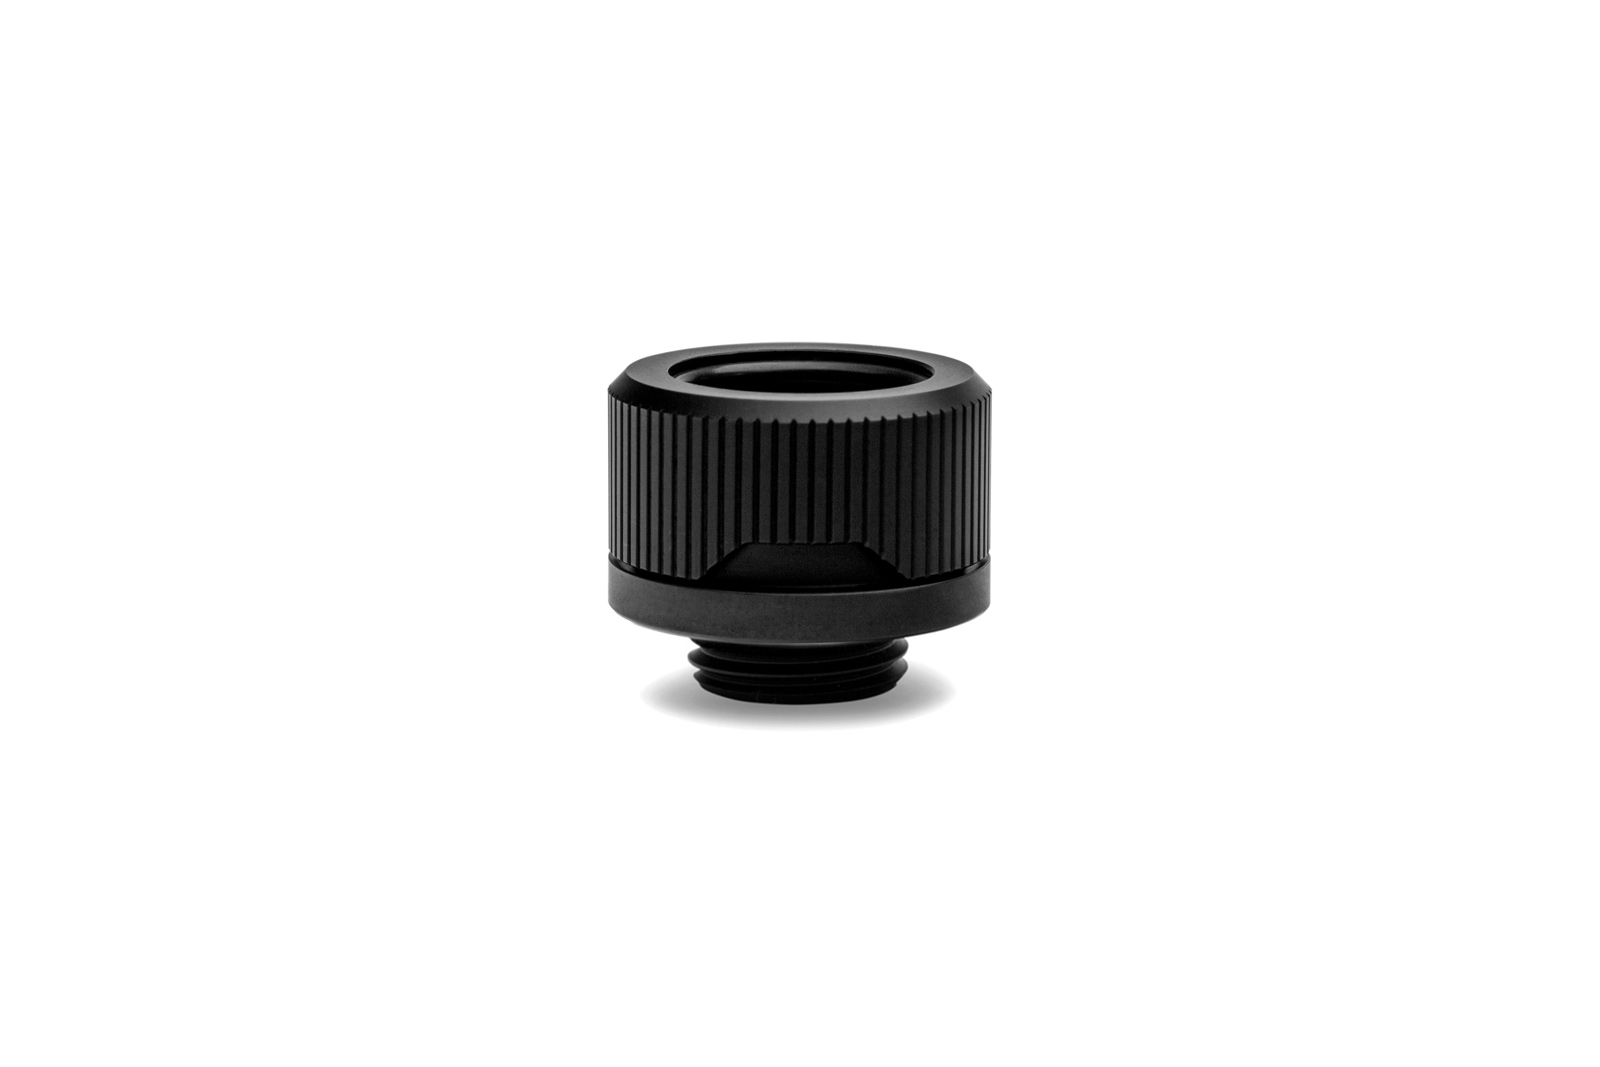 EK_Torque_Fitting_HTC_16_Black